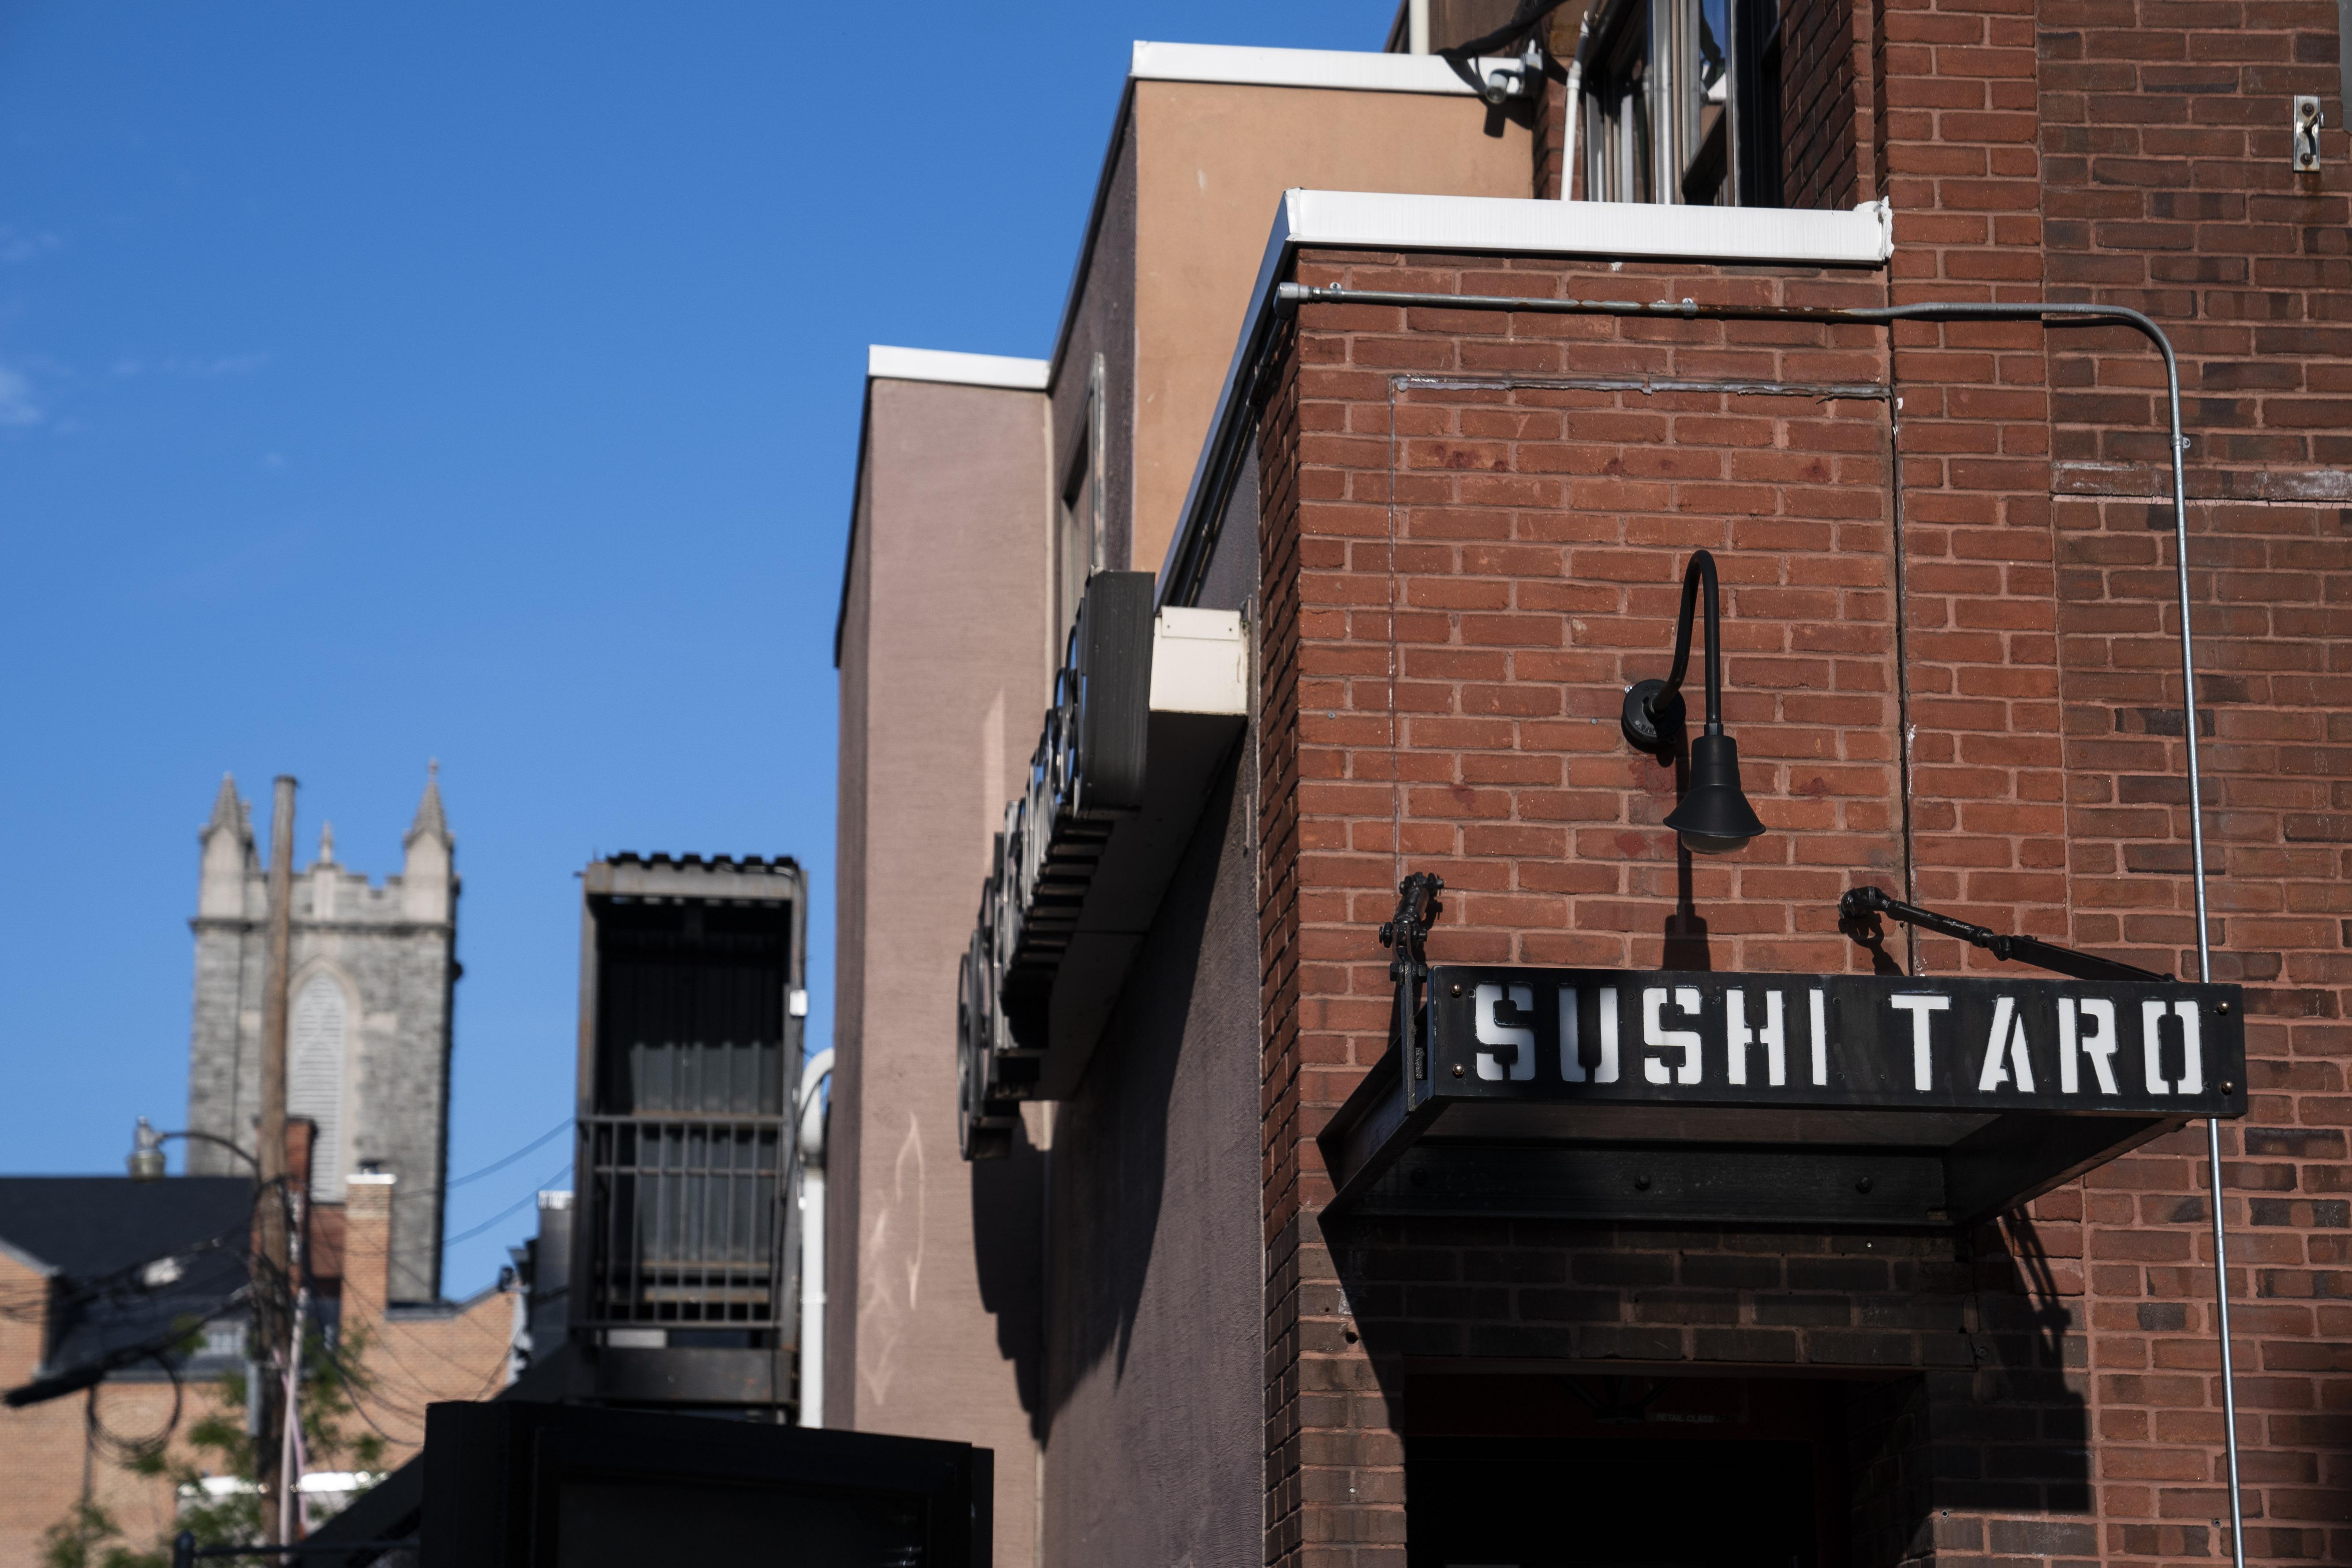 Famed D.C. Sushi Restaurant Sushi Taro Announces Its Closing